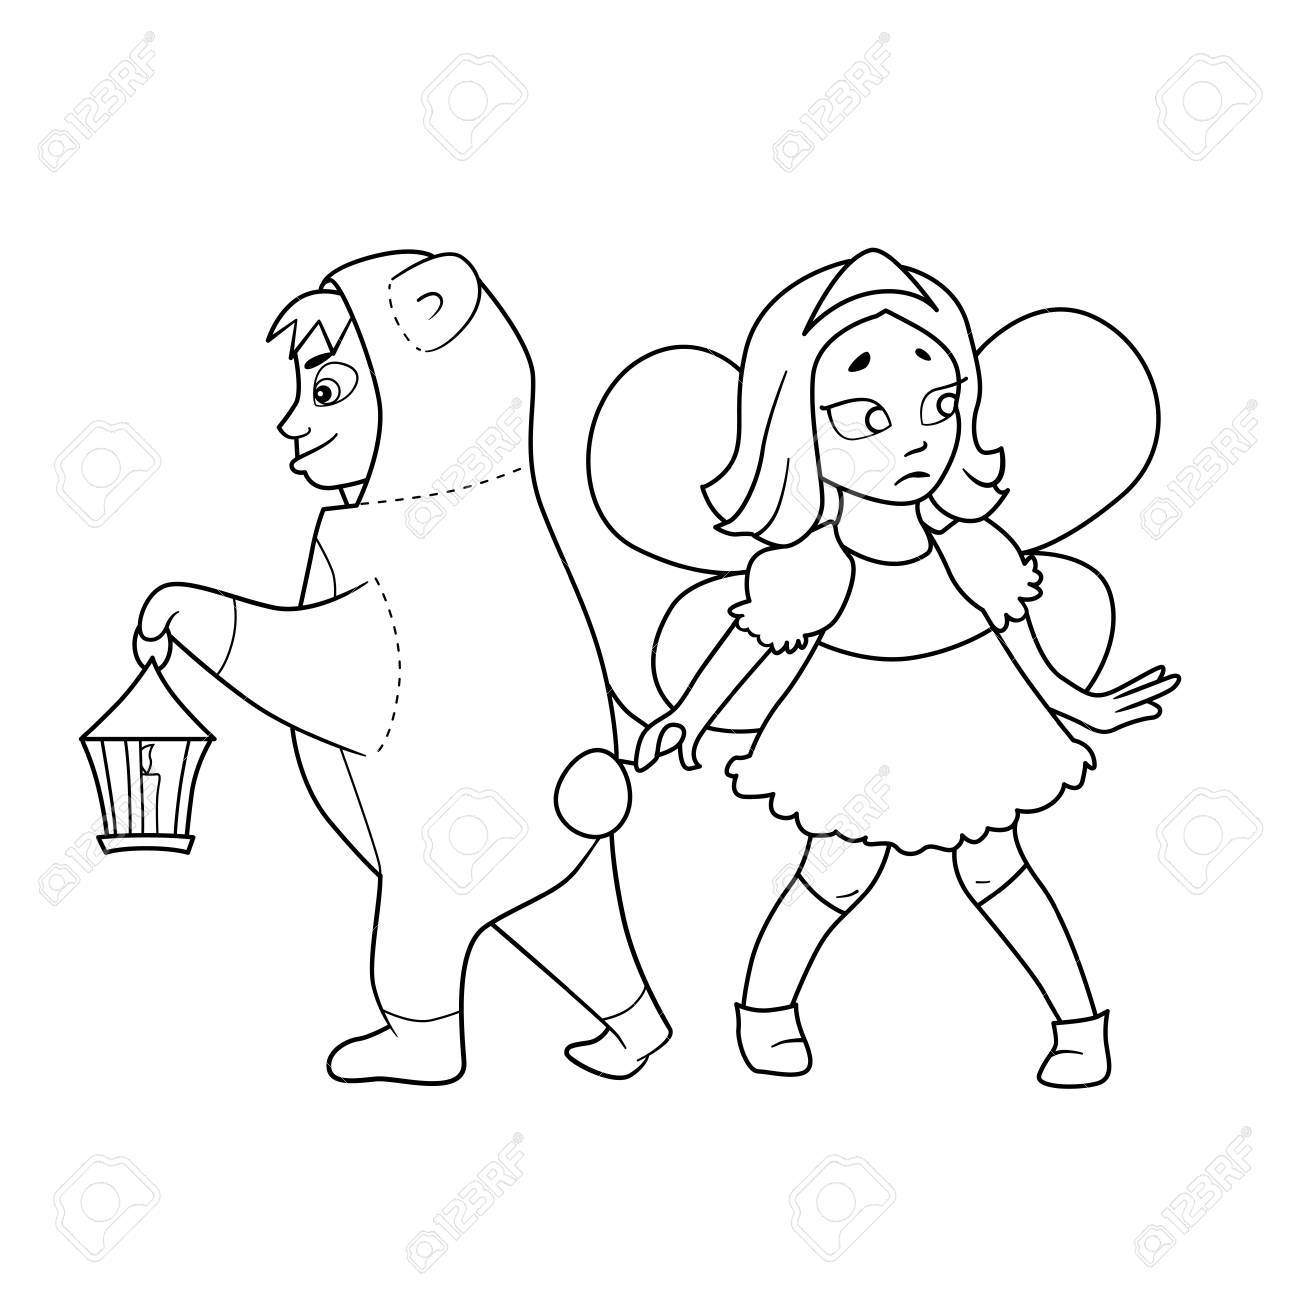 Libro Para Colorear Con Dibujos Animados De Niño En Traje De Oso Con ...